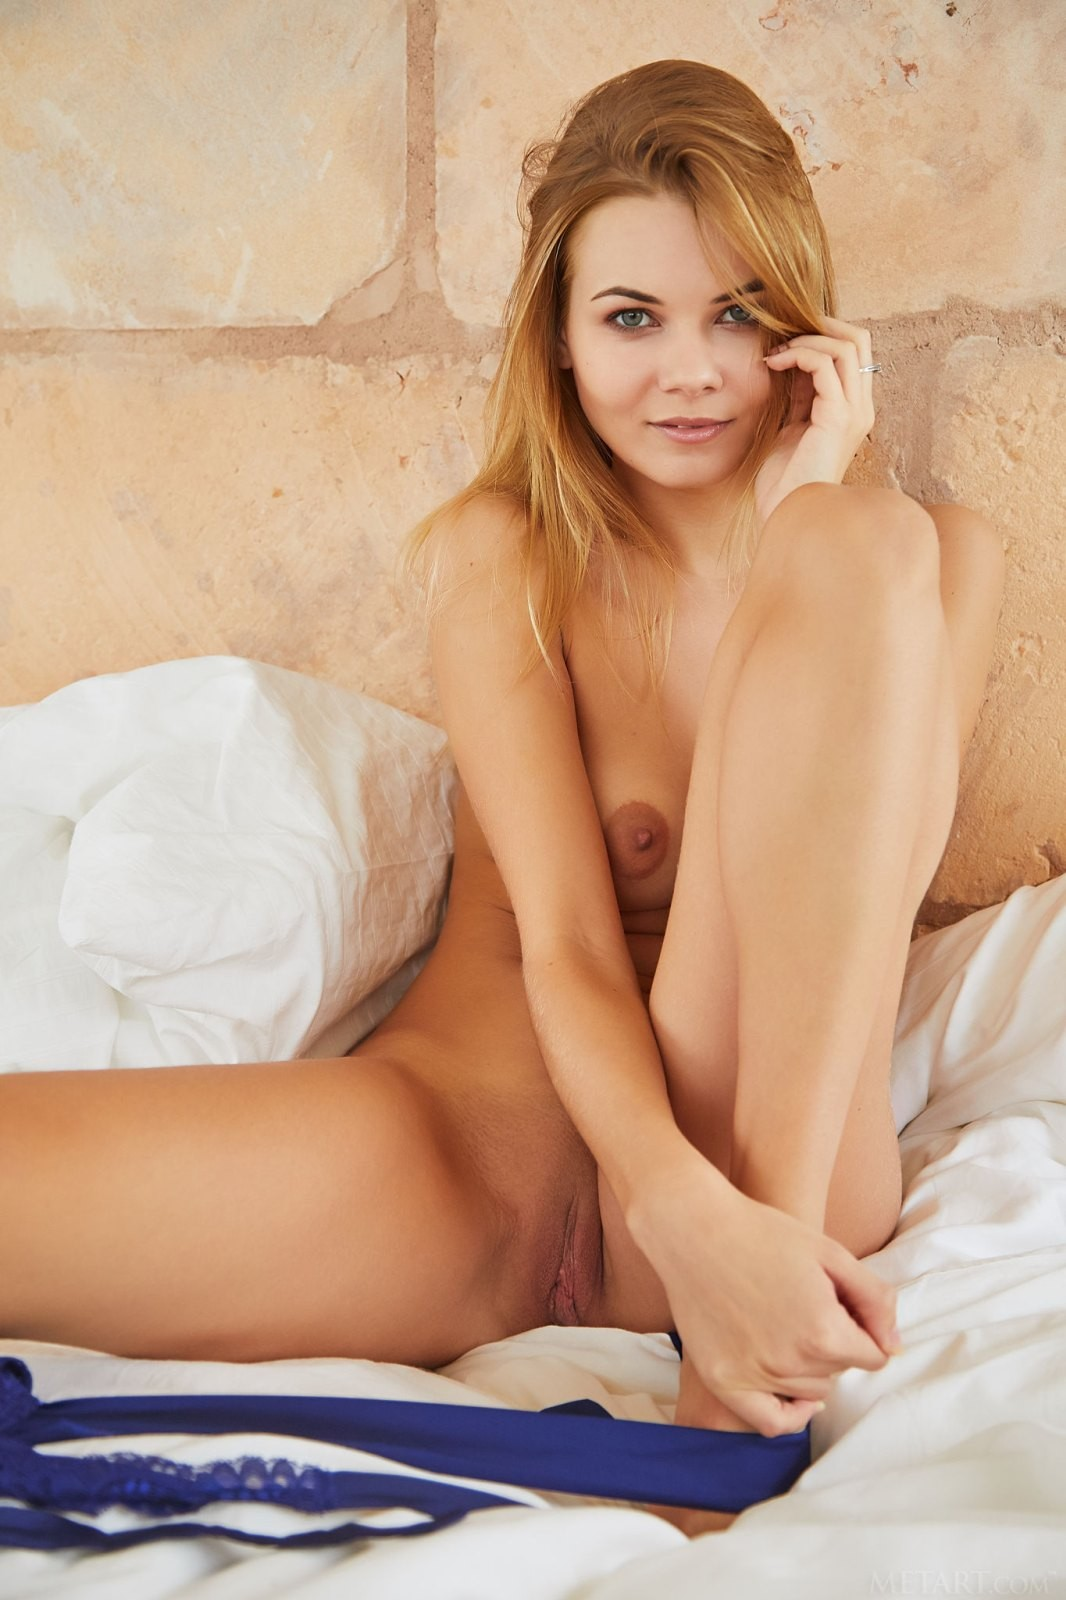 Красотка снимает боди на кровати - фото